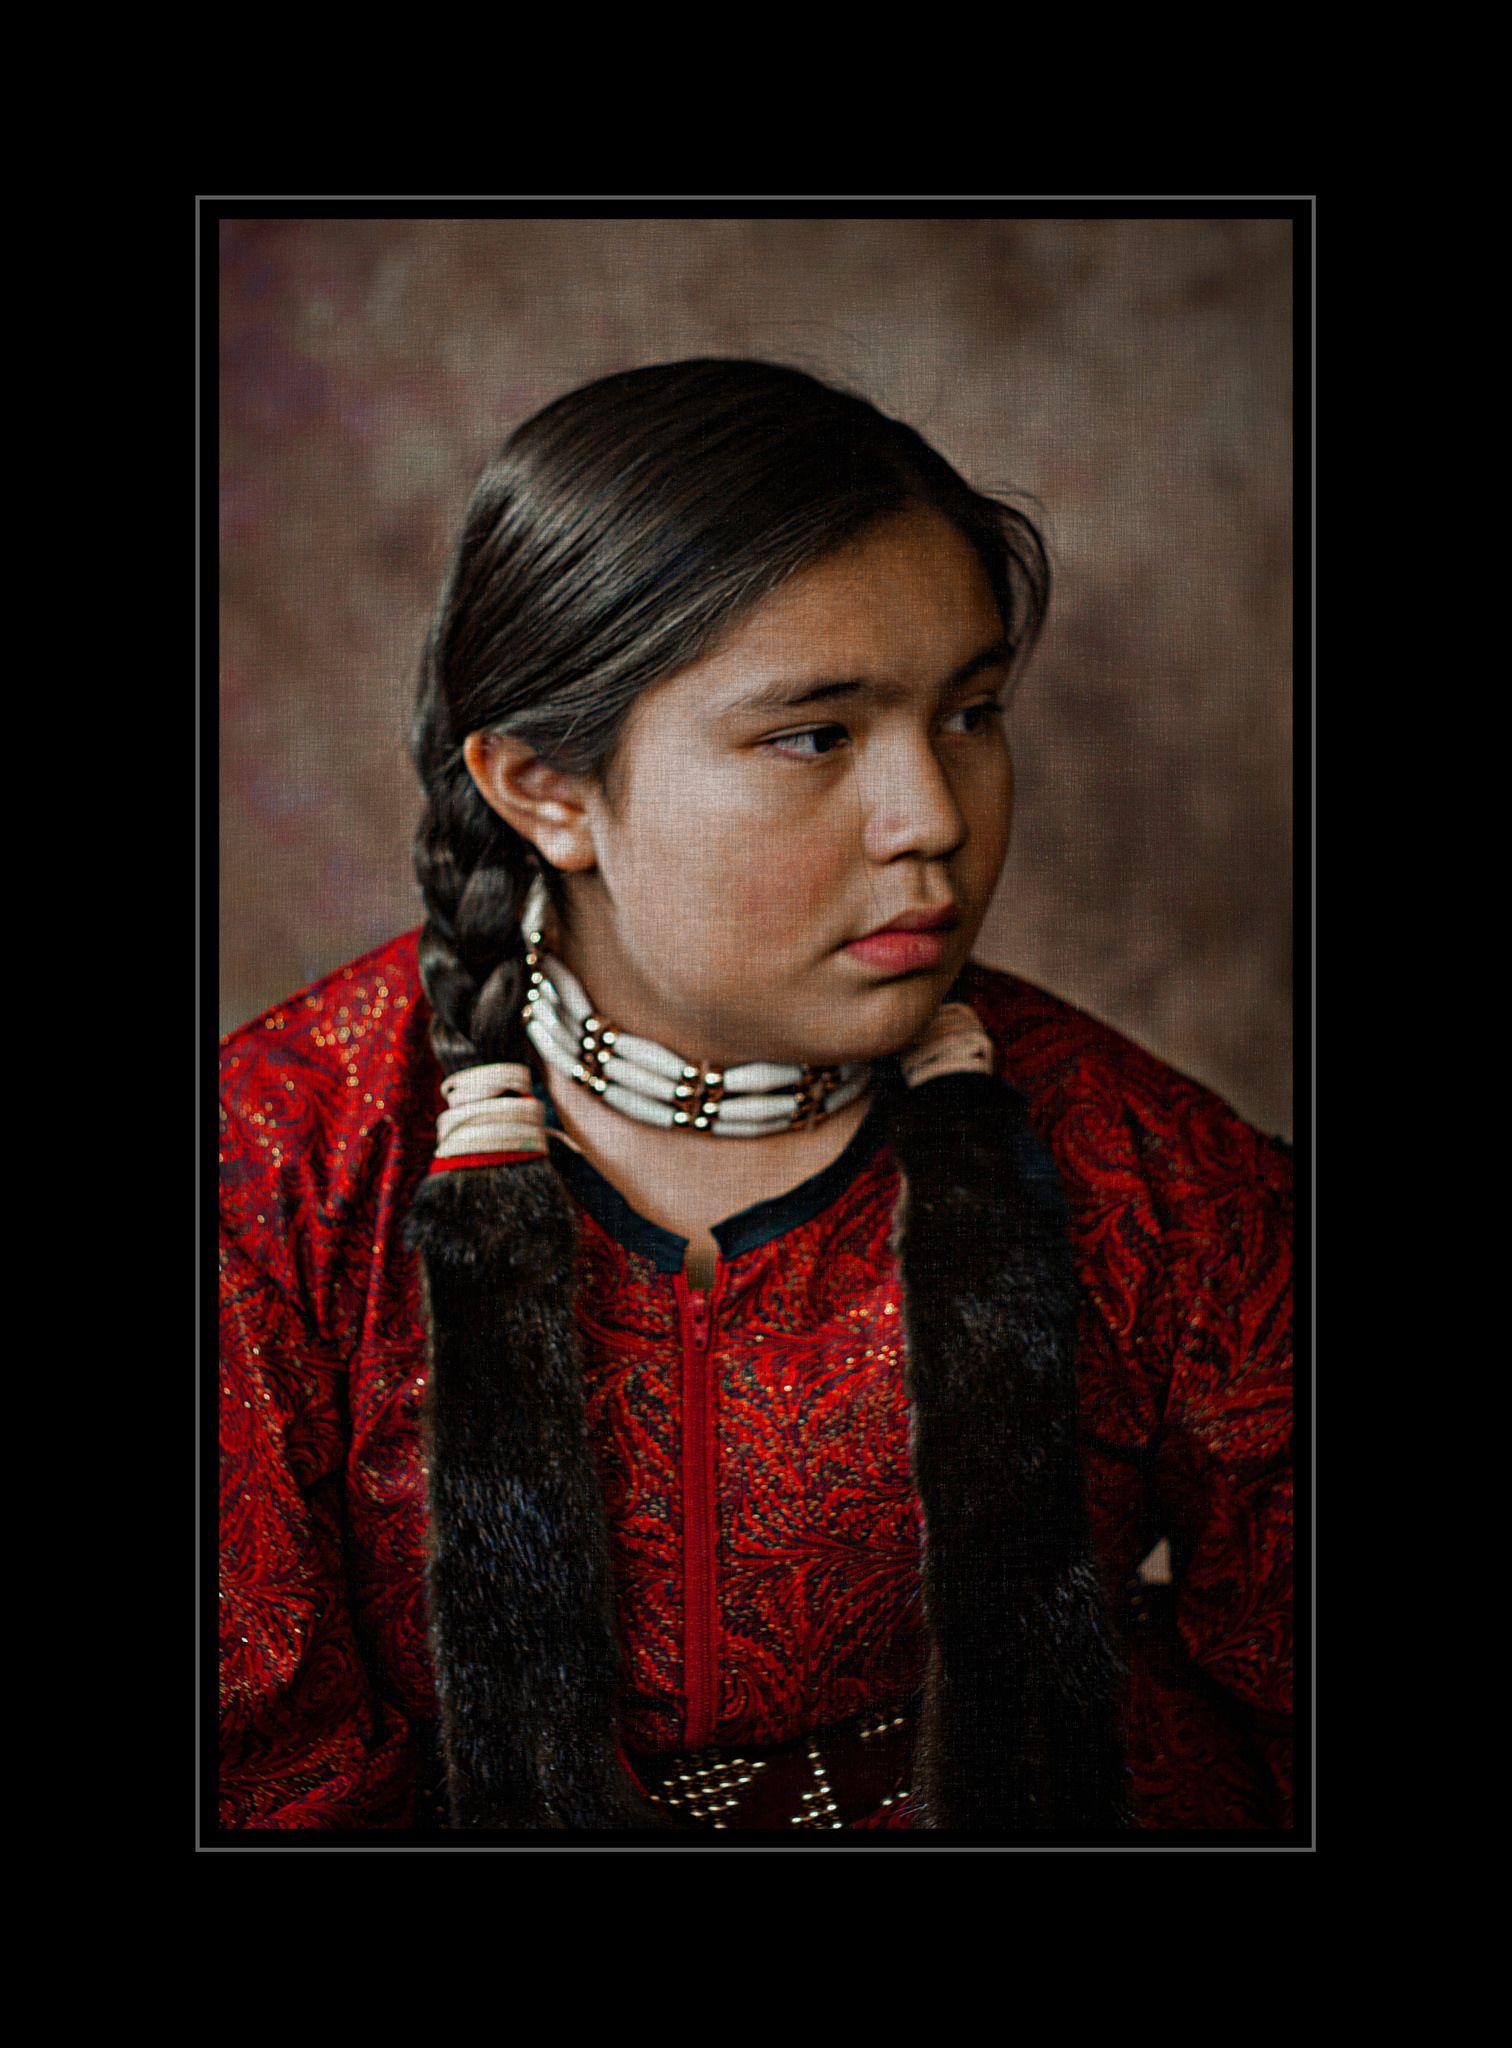 Olsenartphotography alberta canada and explore